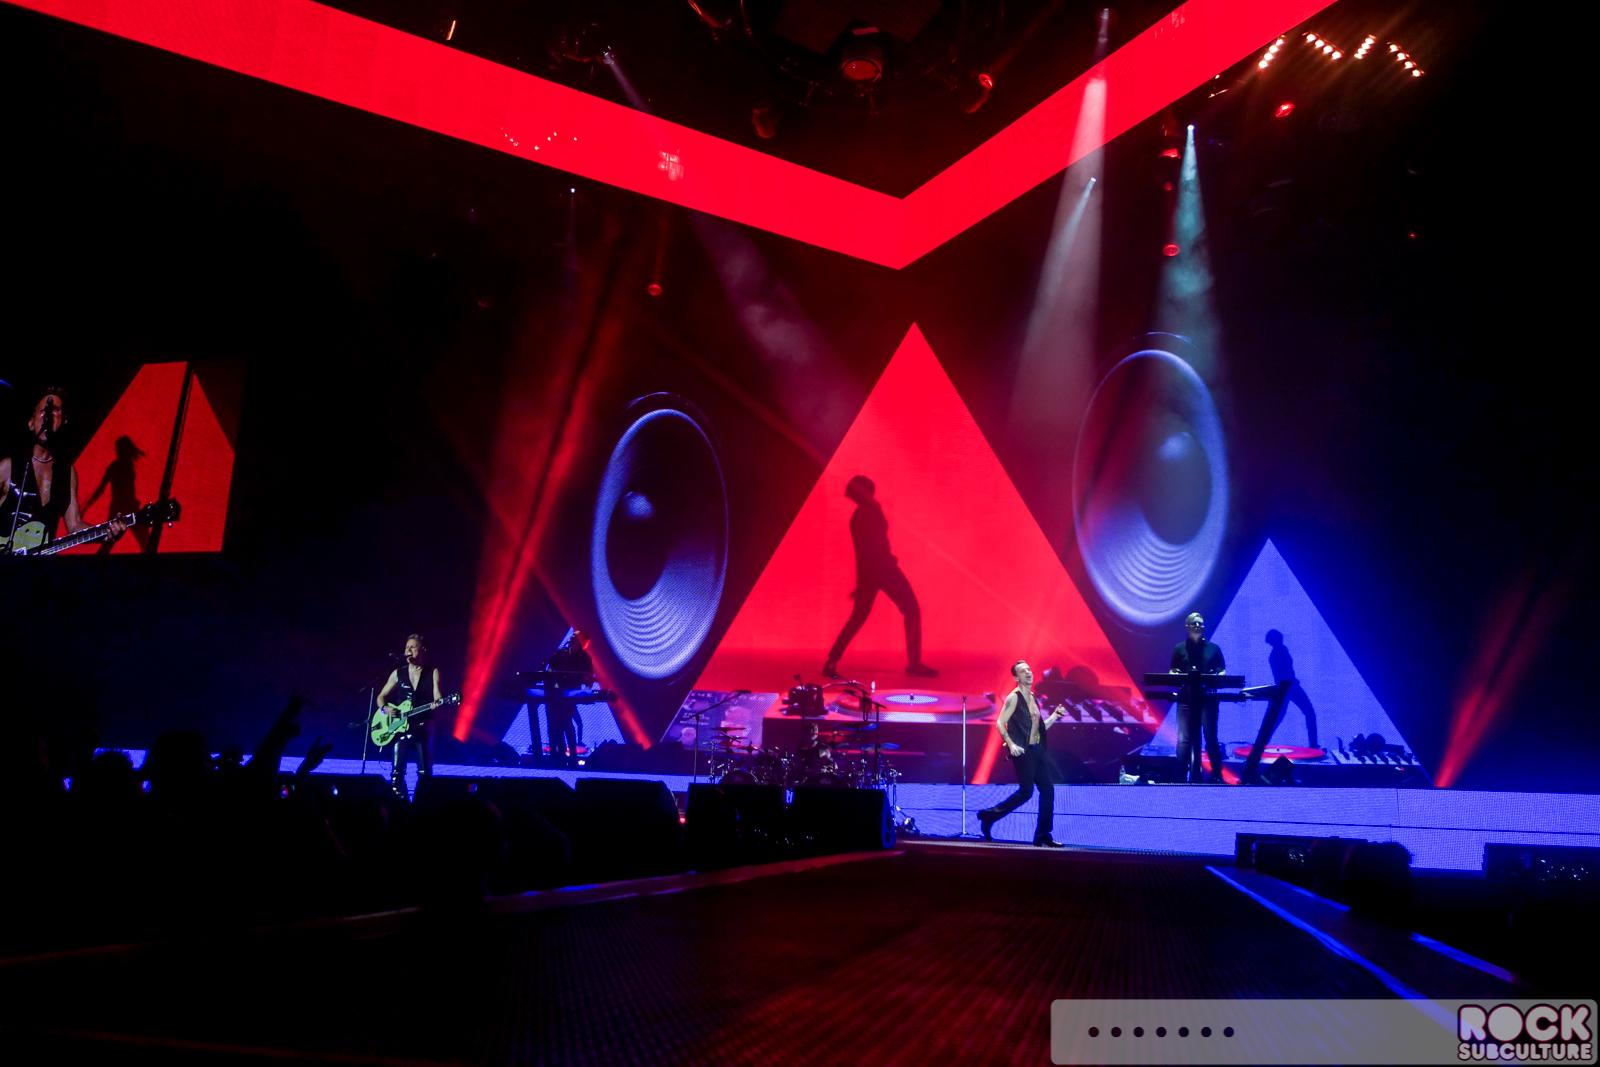 Depeche Mode Delta Machine Tour European Leg At The O2